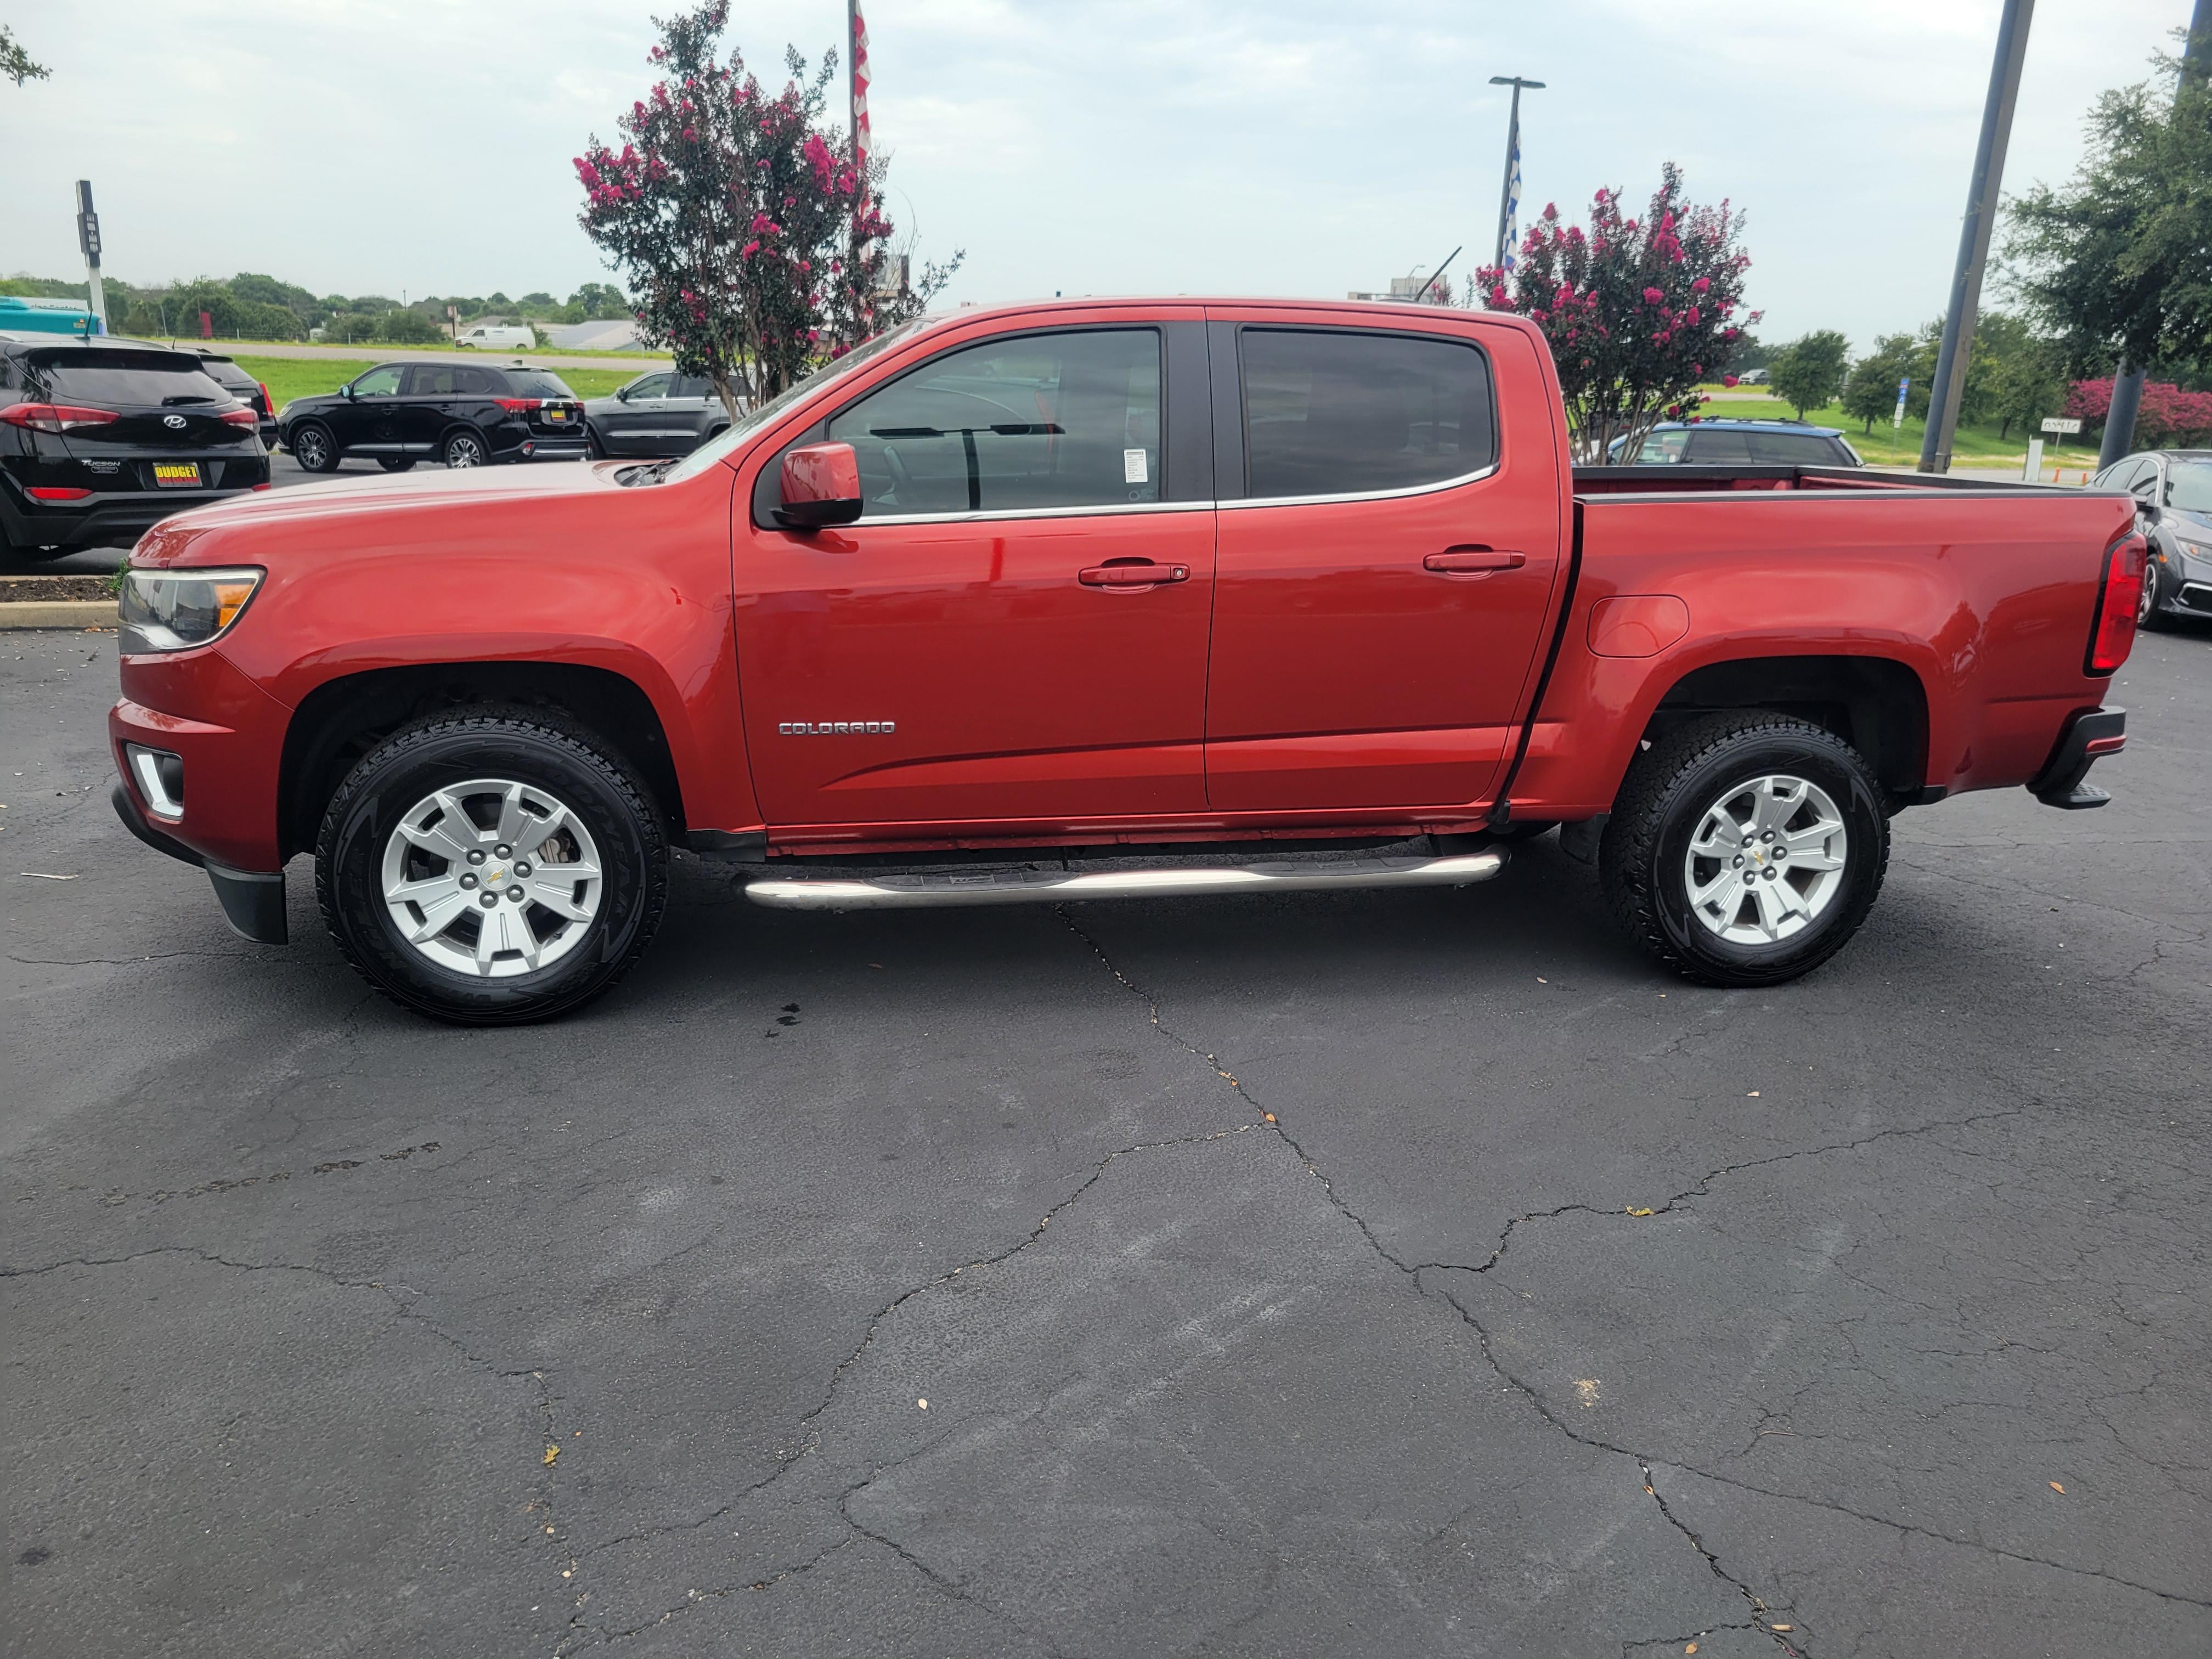 used vehicle - Truck CHEVROLET COLORADO 2016